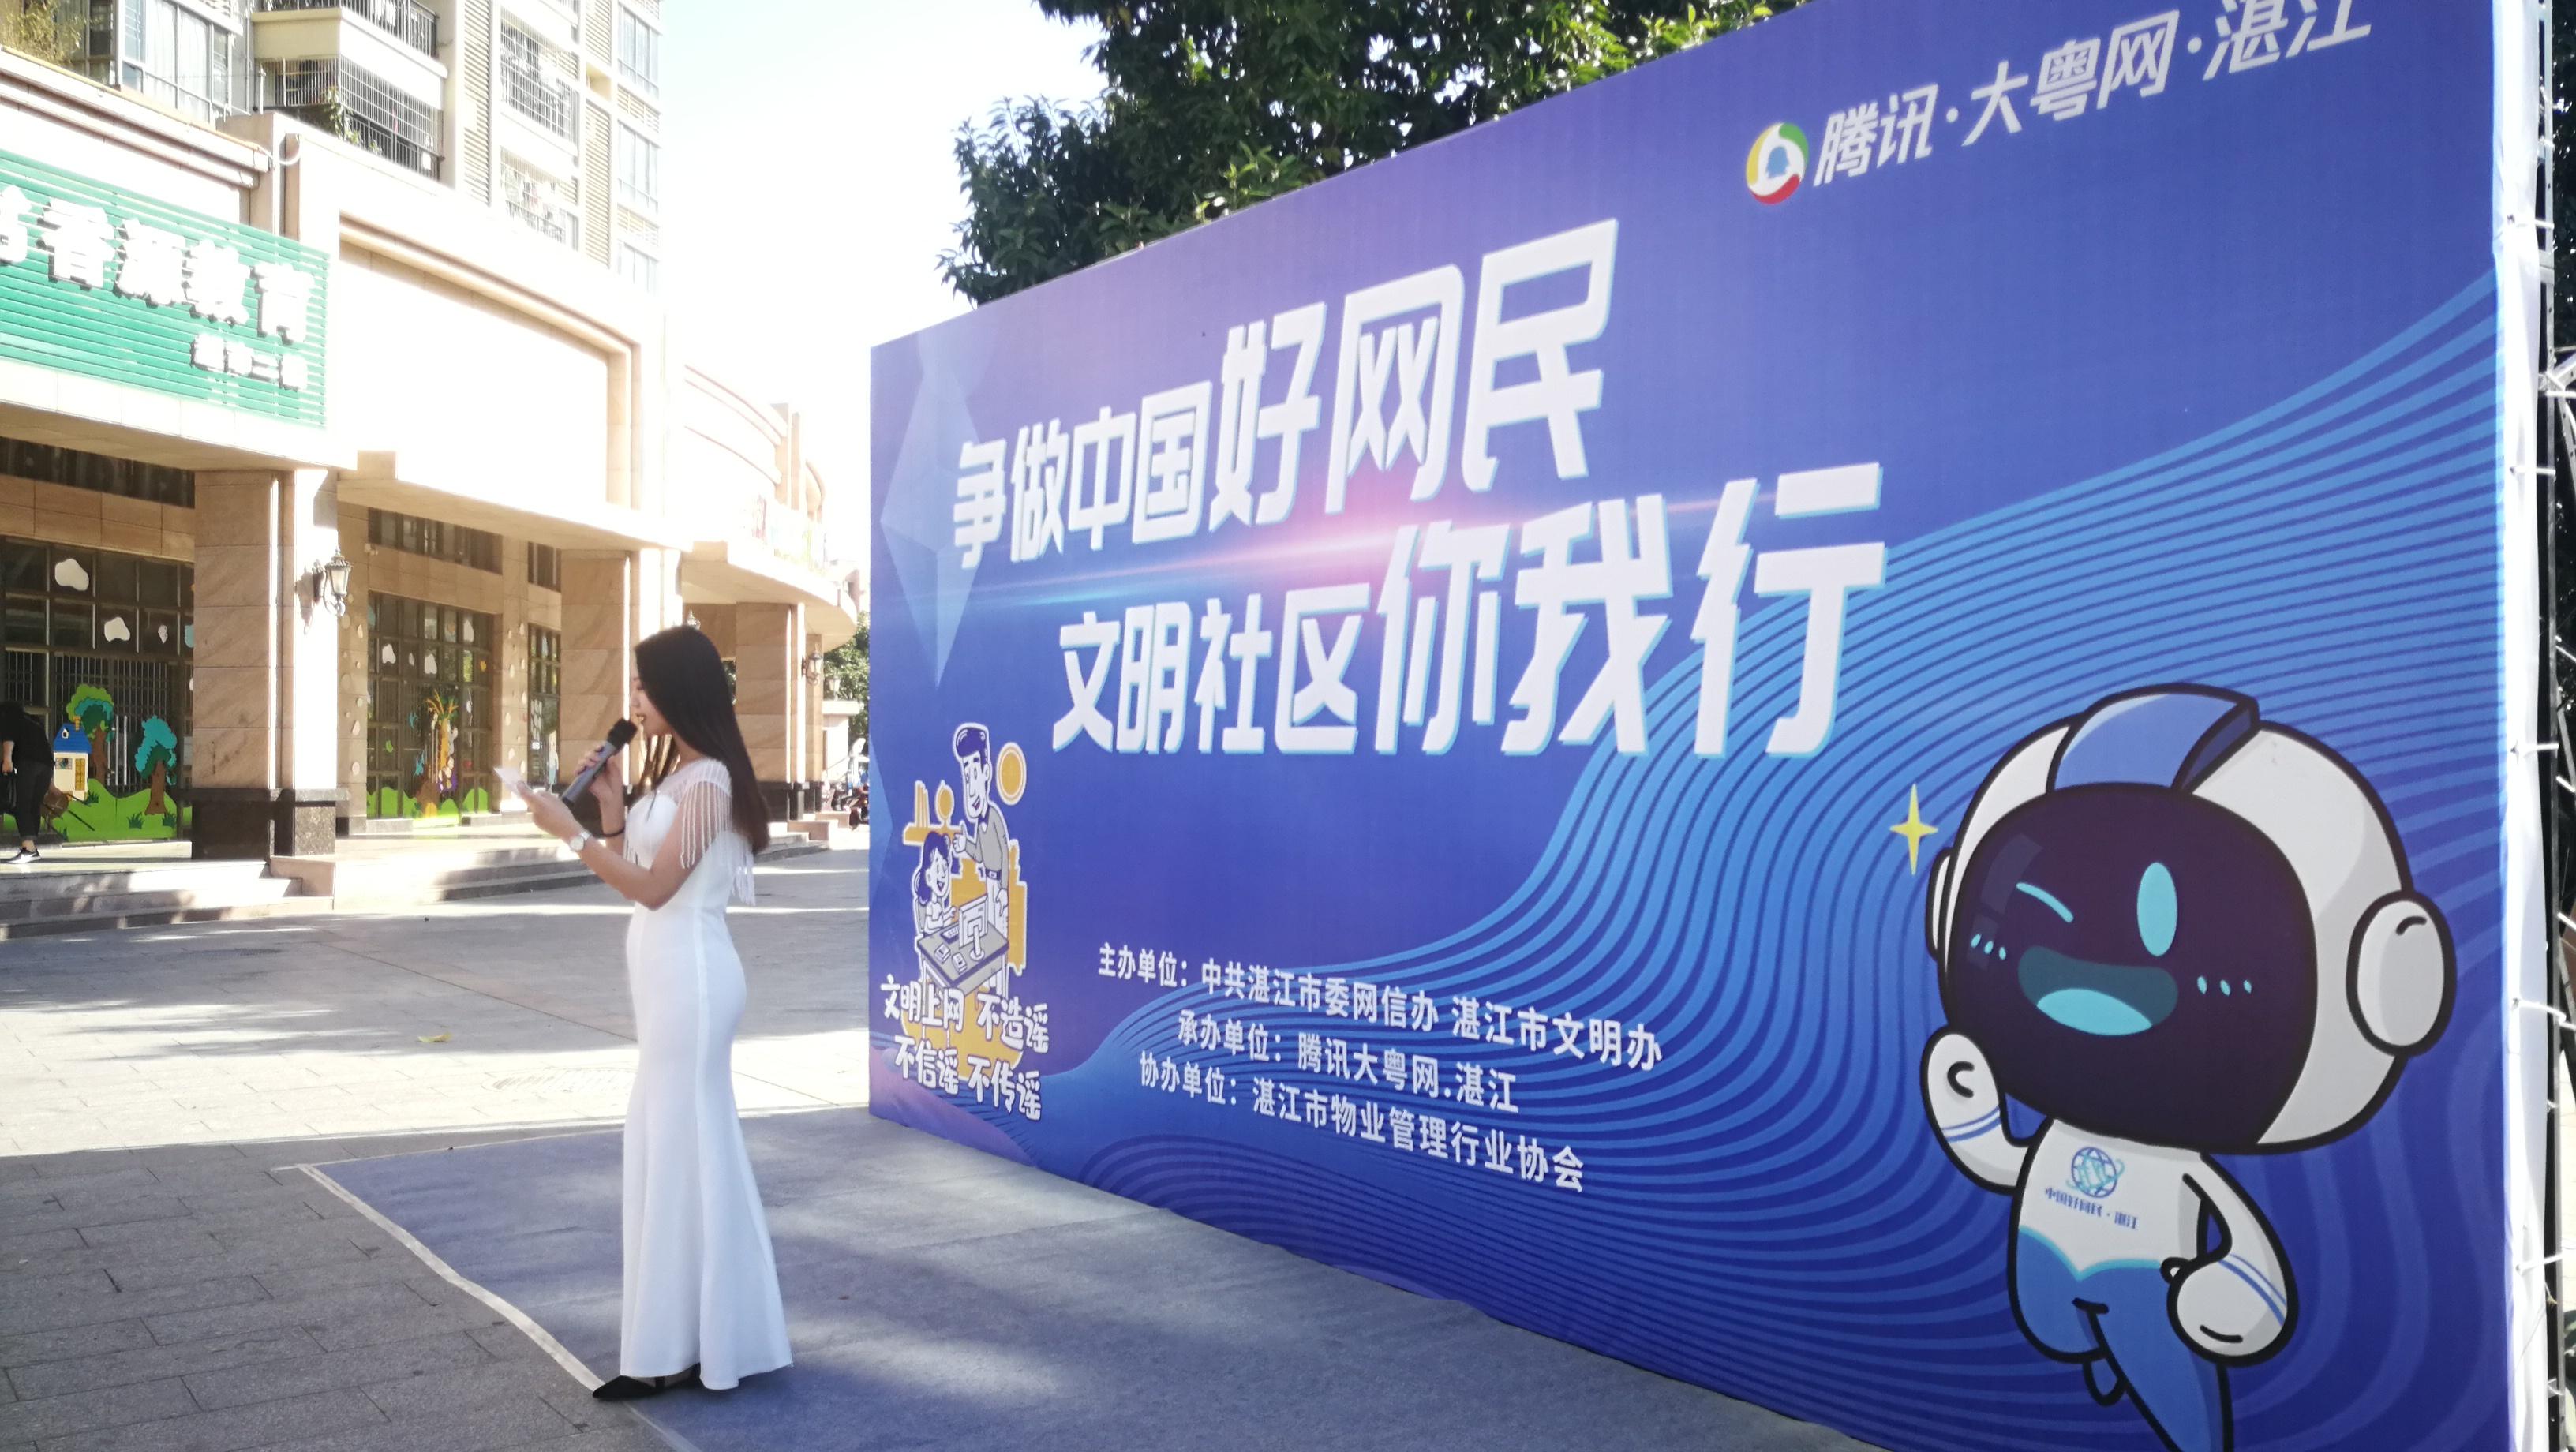 "<strong>湛江掀起争做""中国好网民""热潮</strong>"